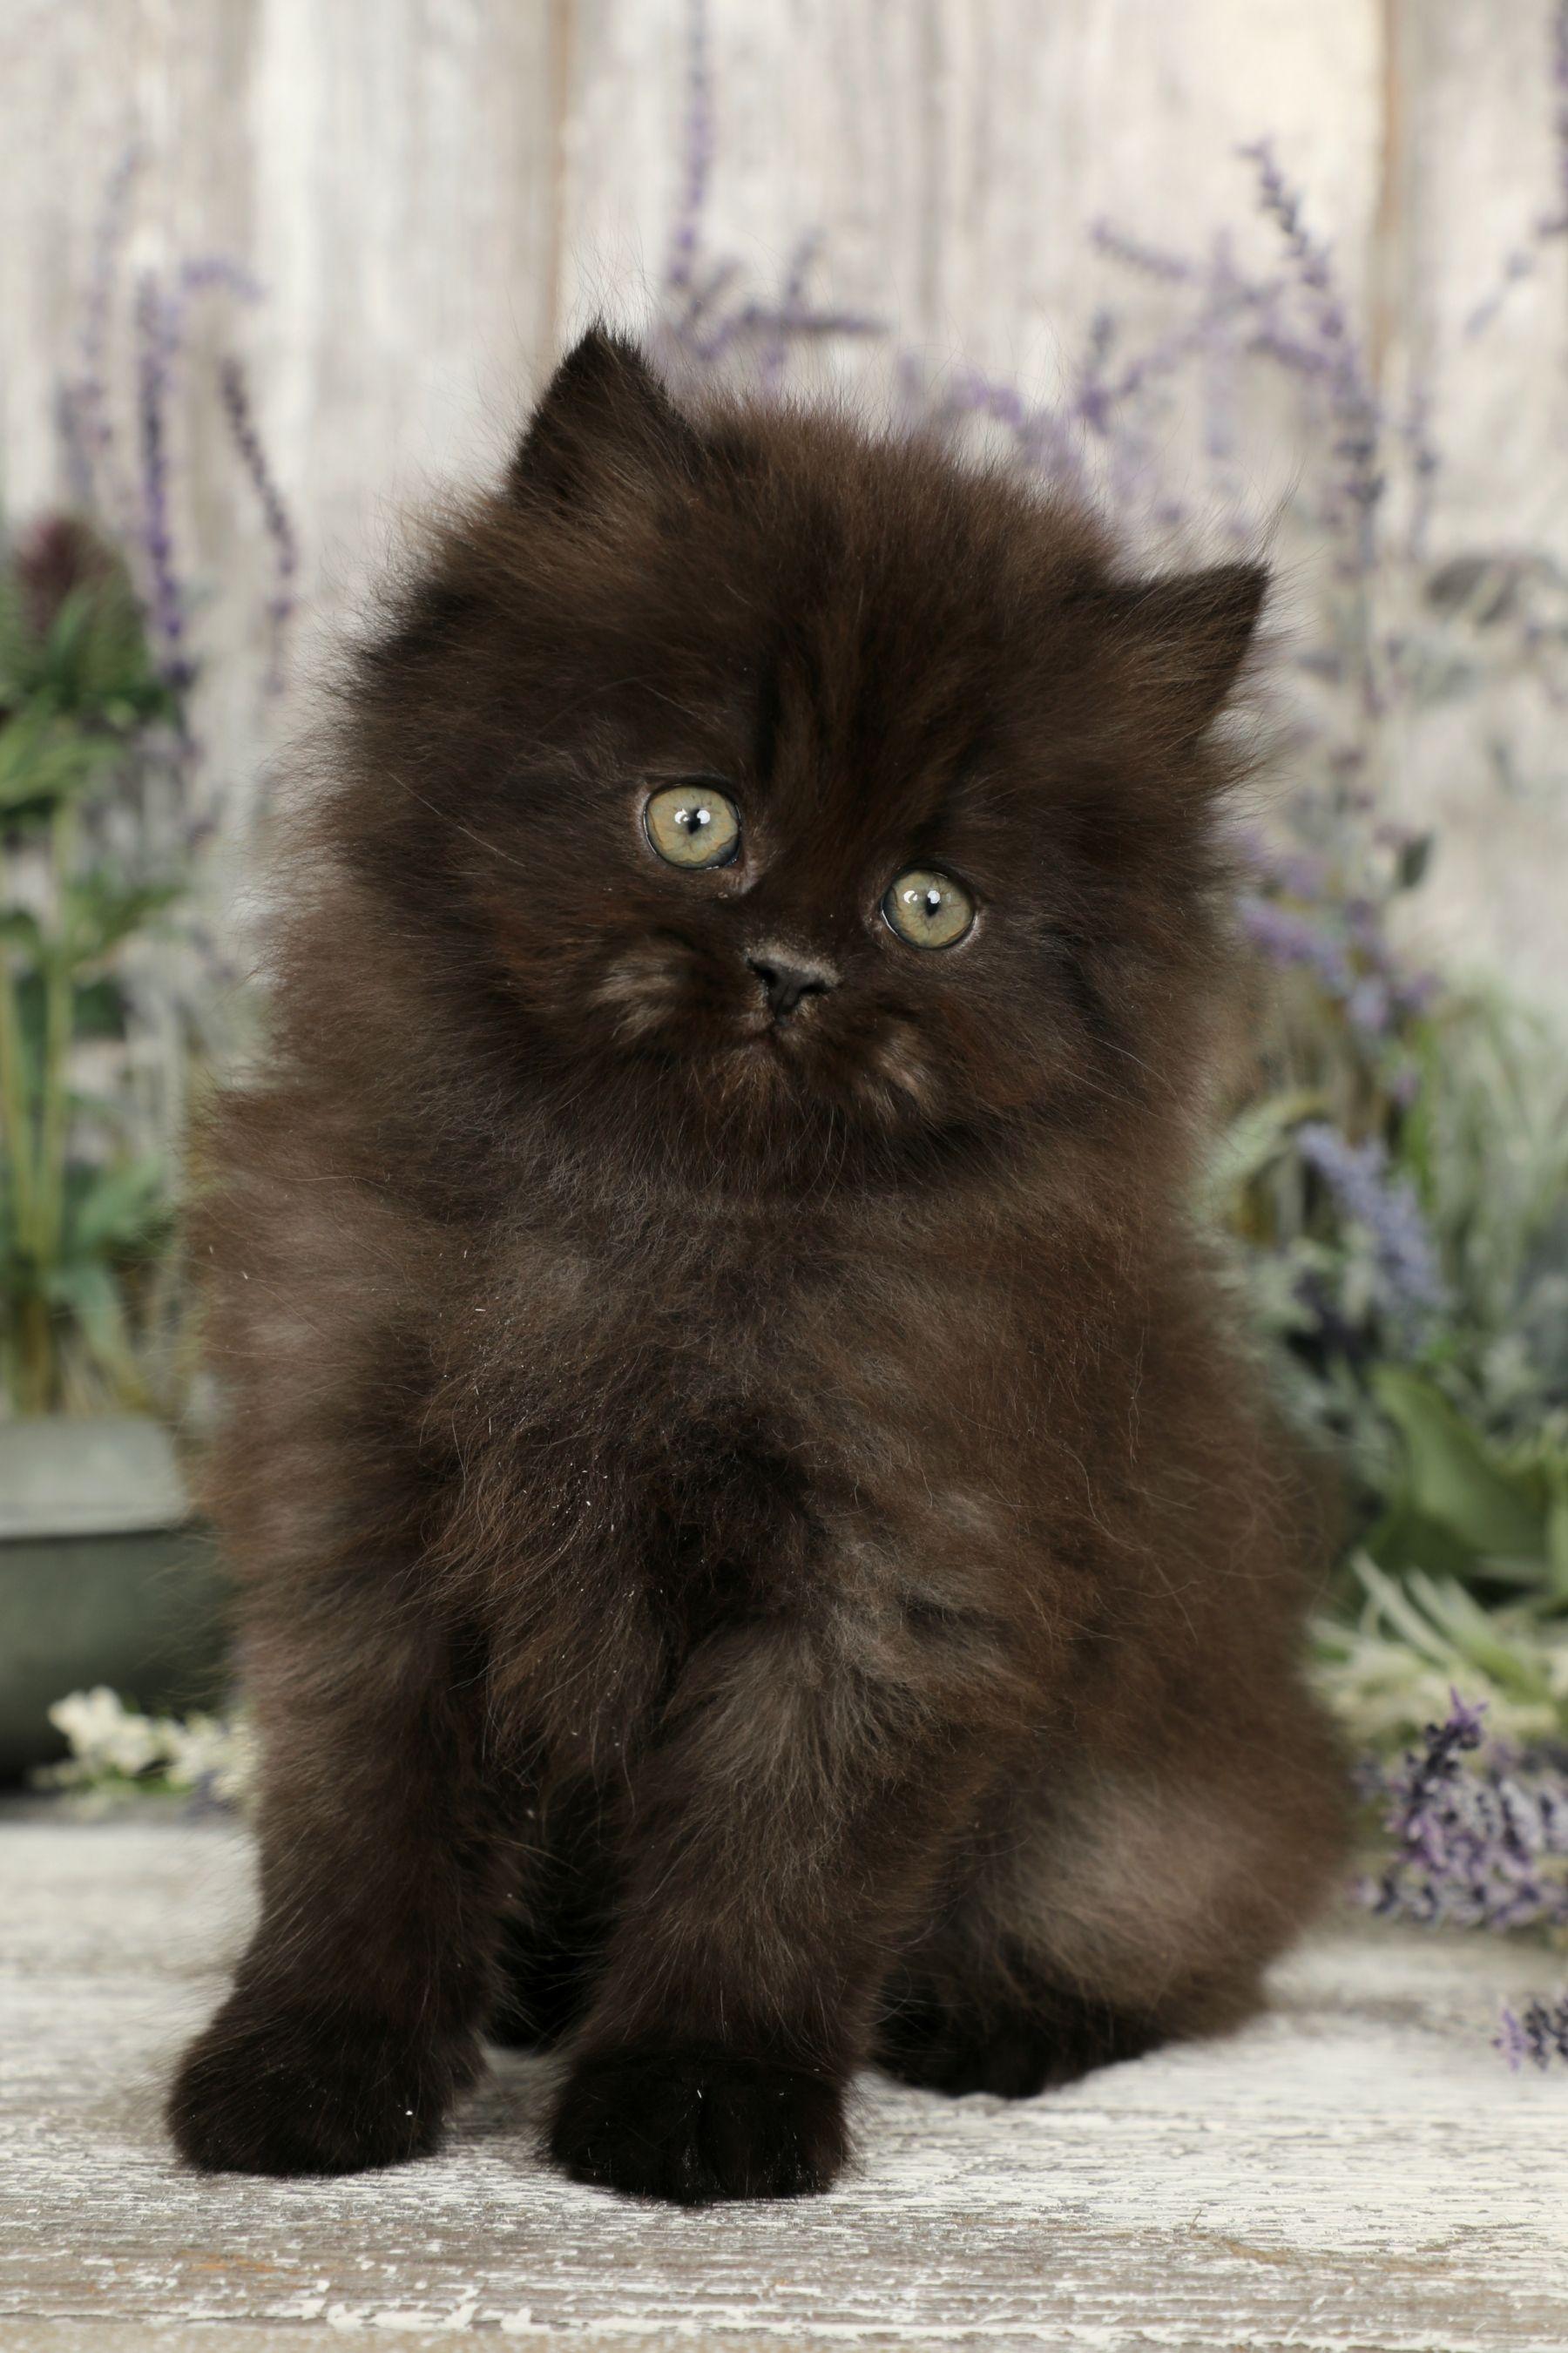 Doll Face Persian Kittens Black Persian Kitten Persian Kittens Kitten Pictures Persian Cat Doll Face